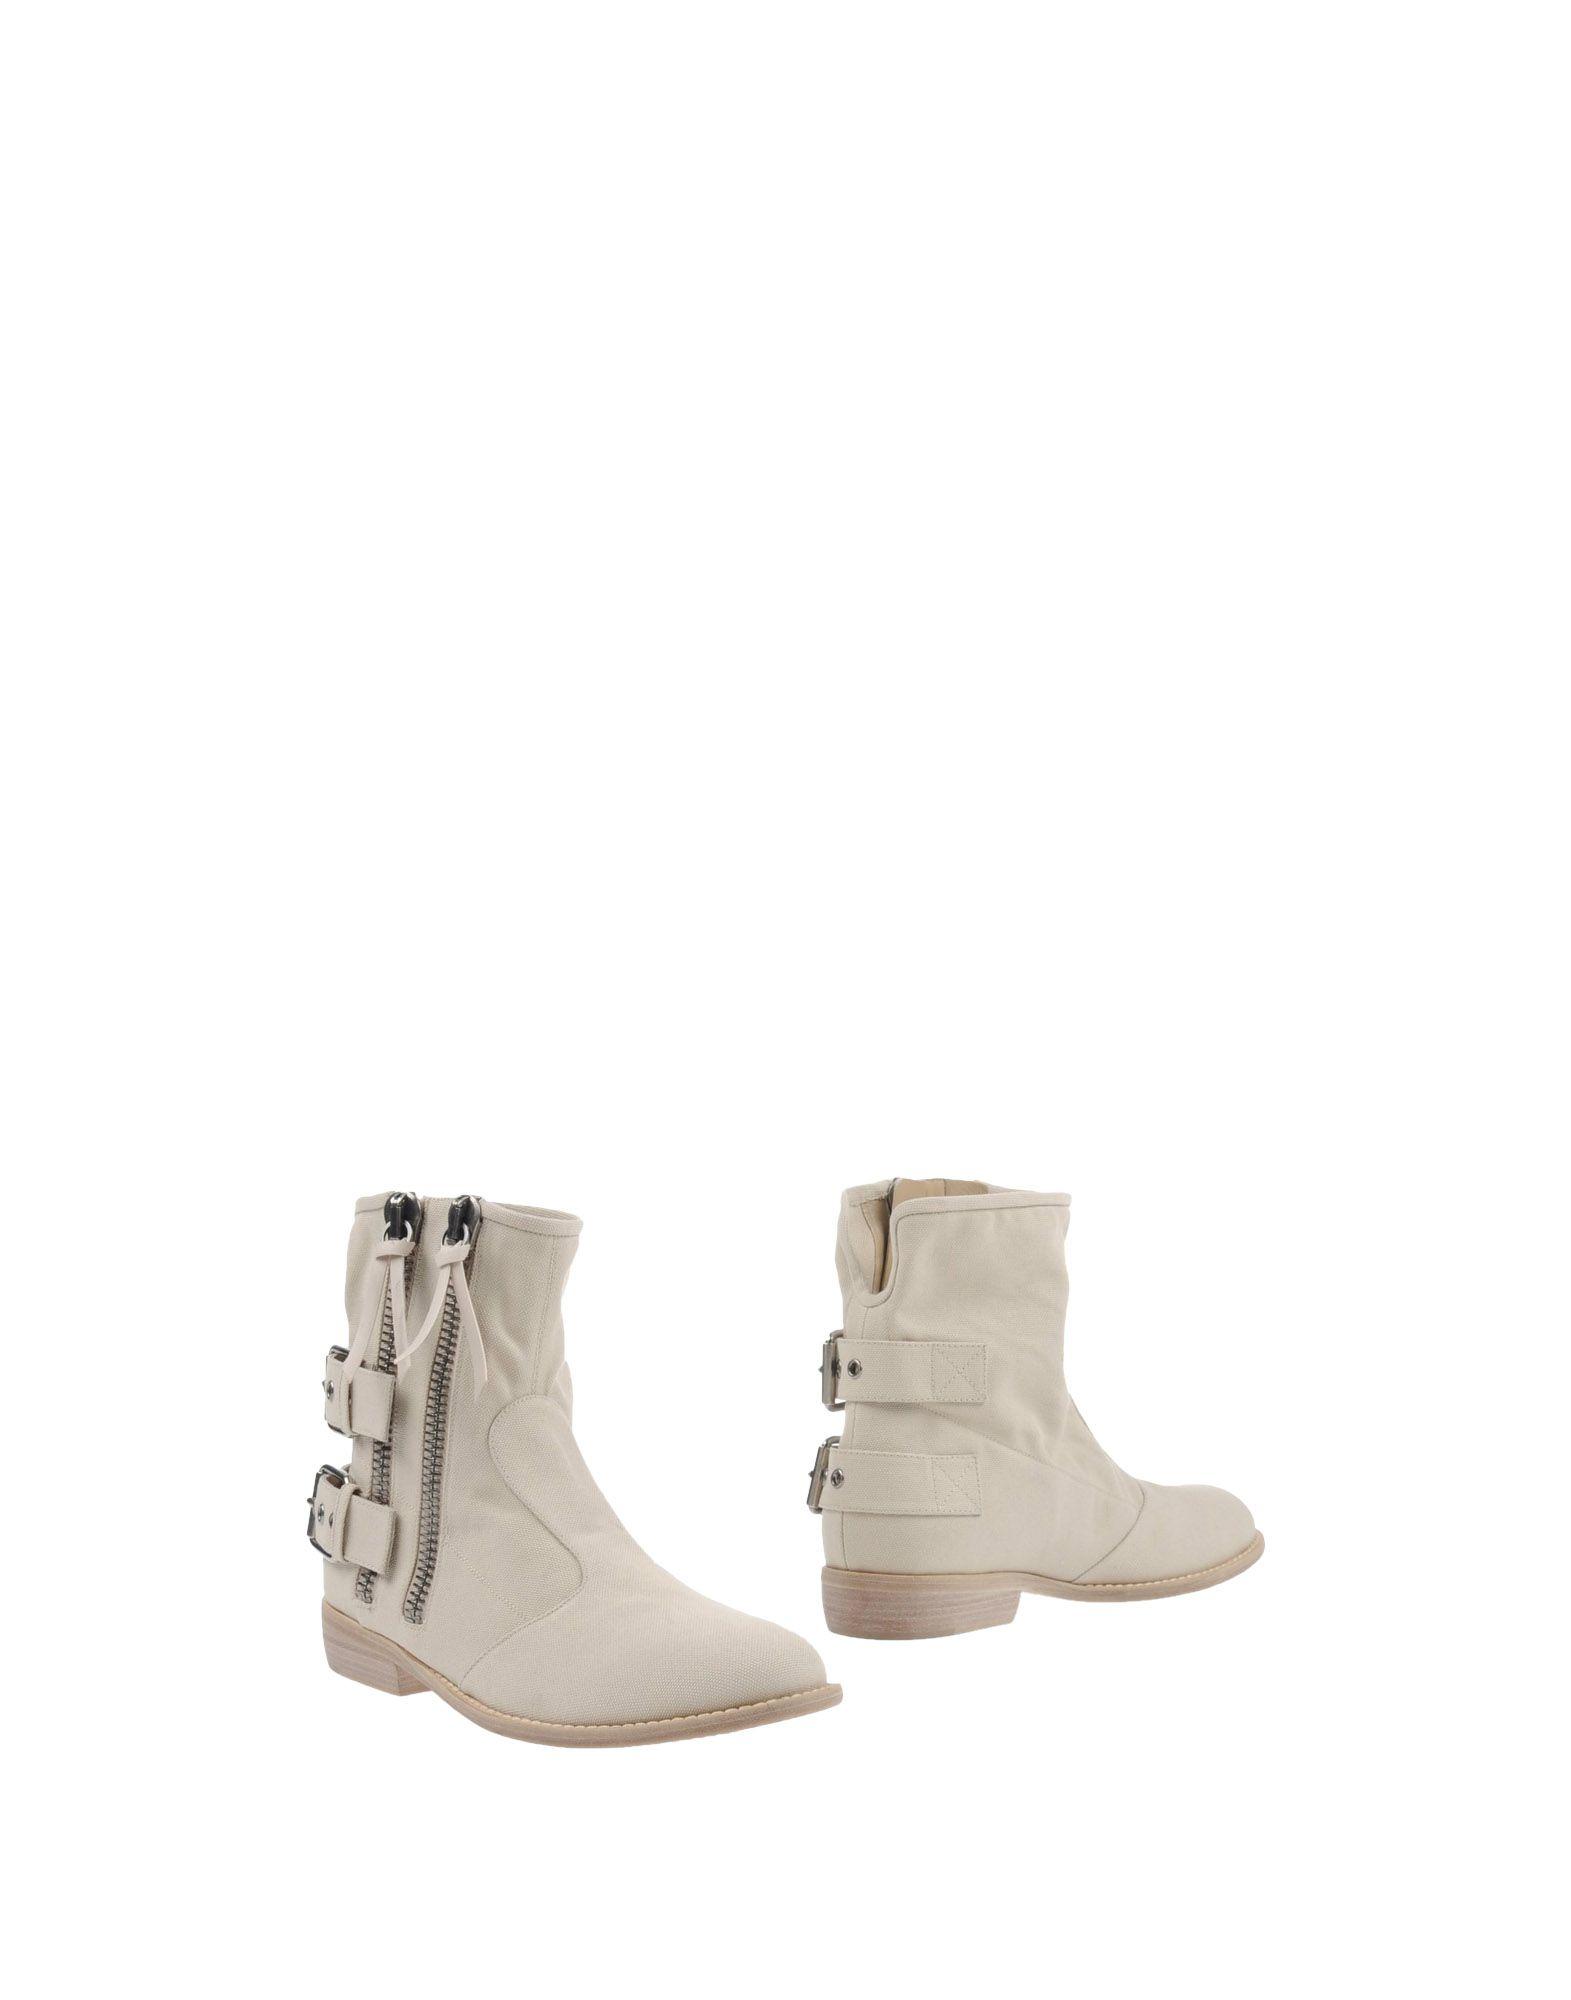 Giuseppe Zanotti Boots - Men Giuseppe  Zanotti Boots online on  Giuseppe Australia - 44774911GV 6f2537